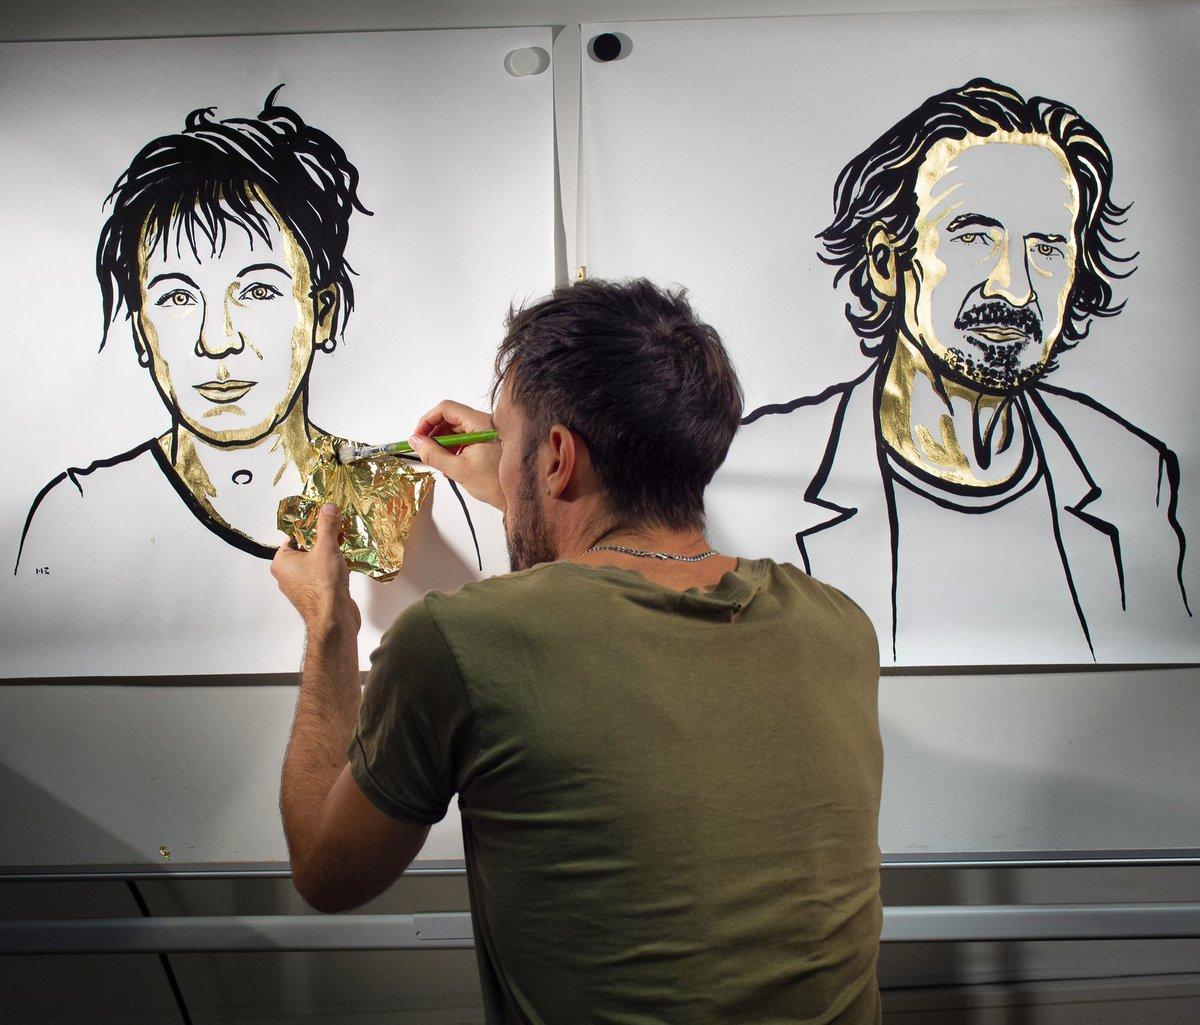 Meet Niklas Elmehed, the talented portrait artist